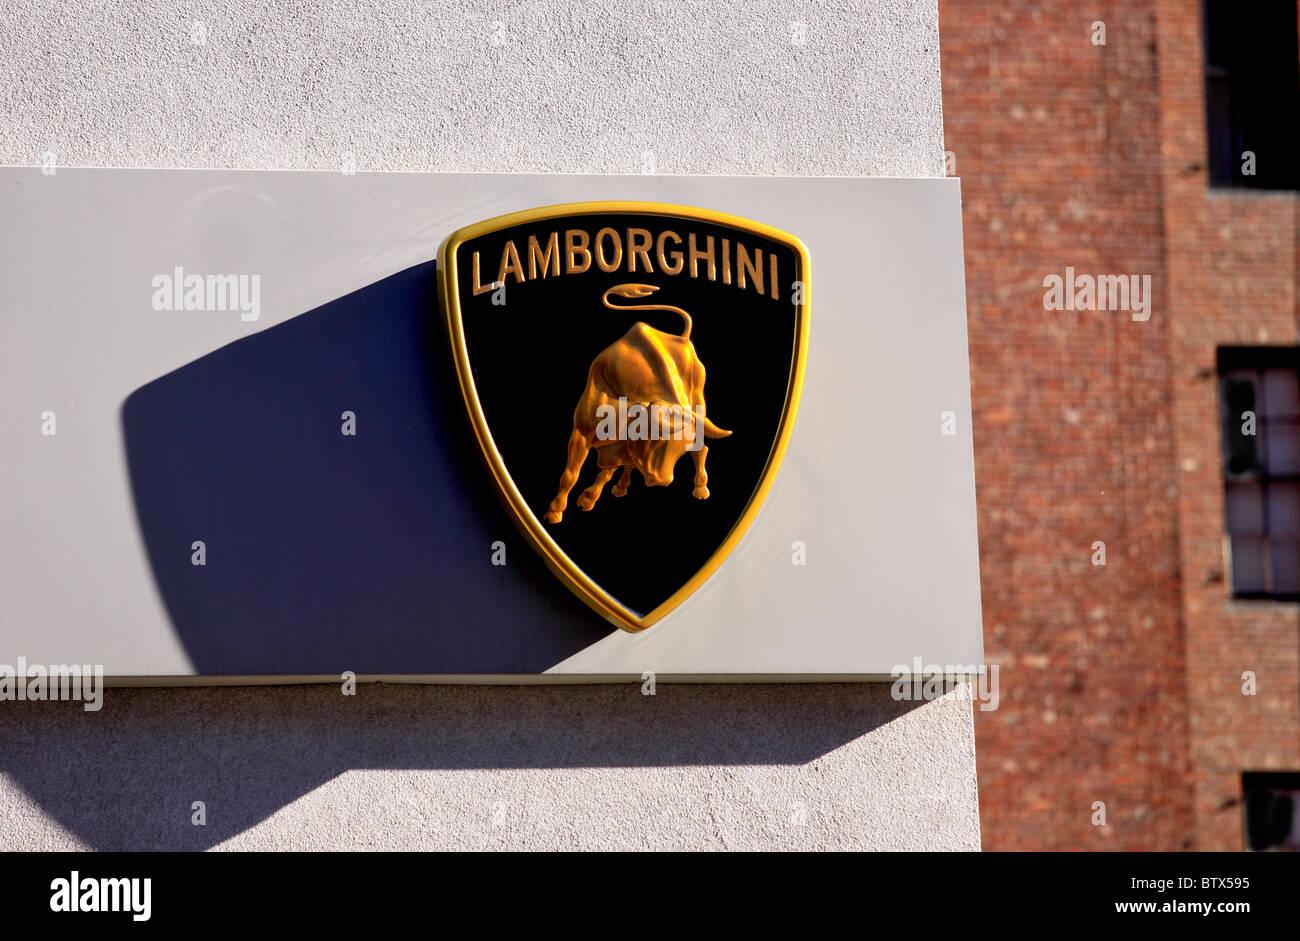 Lamborghini Logo On Car Imagenes De Stock Lamborghini Logo On Car